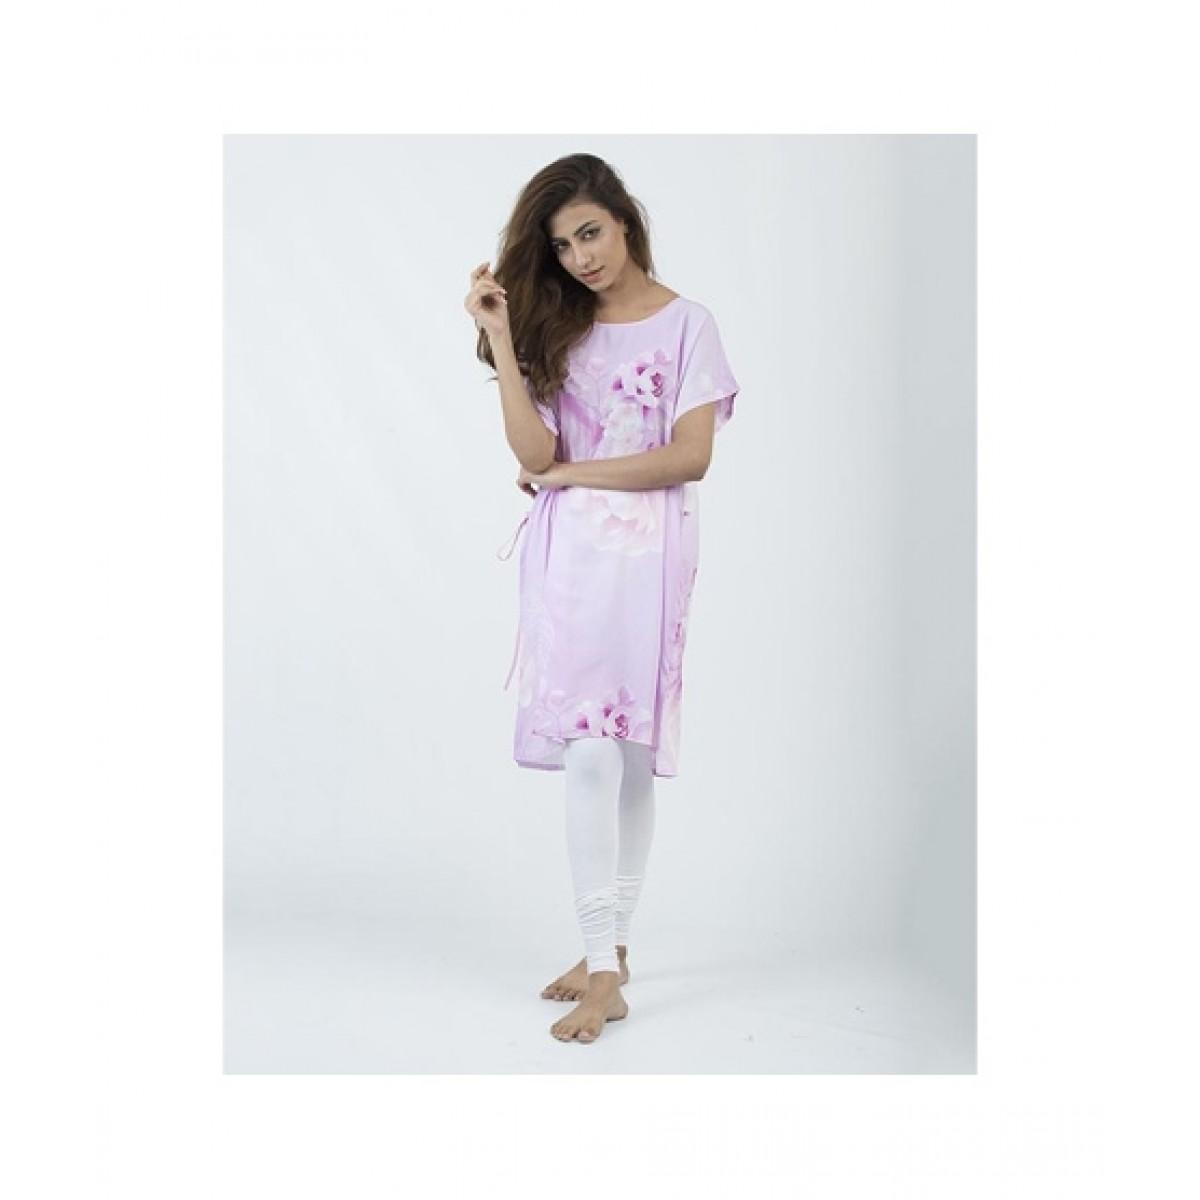 Asaan Buy Cotton Slim Fit Sleeveless Night Shirt For Women - Pink